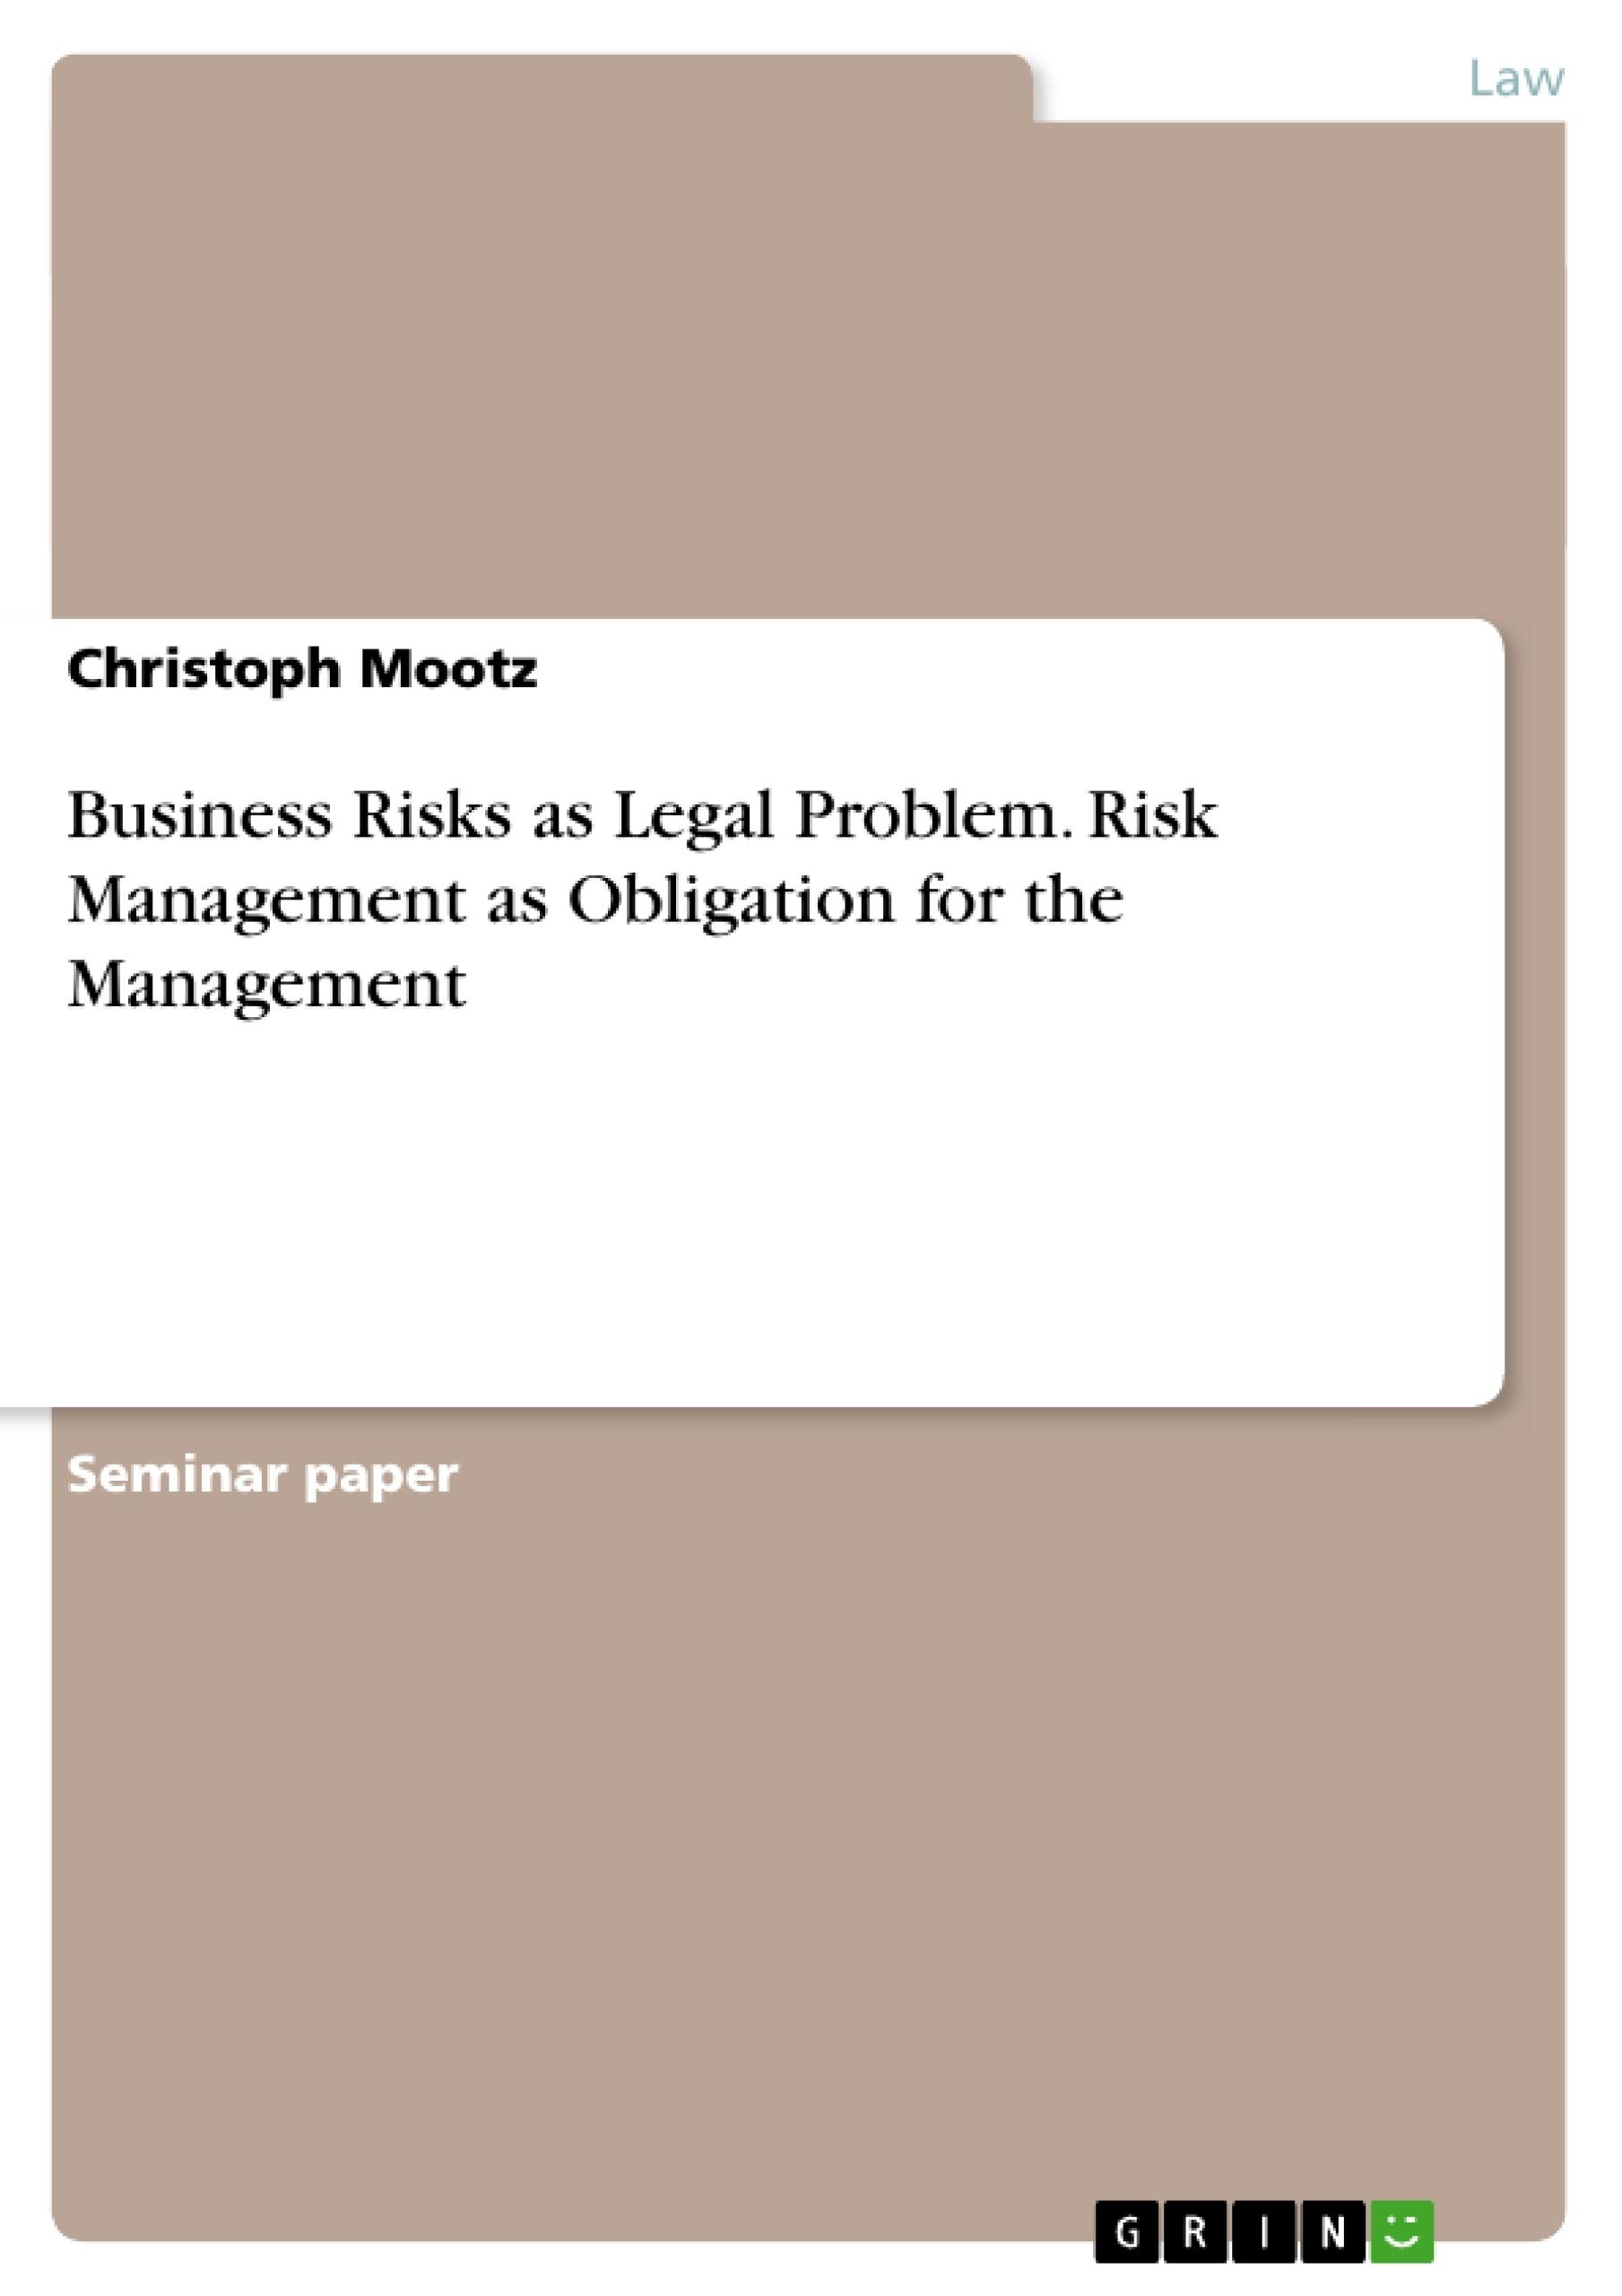 Title: Business Risks as Legal Problem. Risk Management as Obligation for the Management